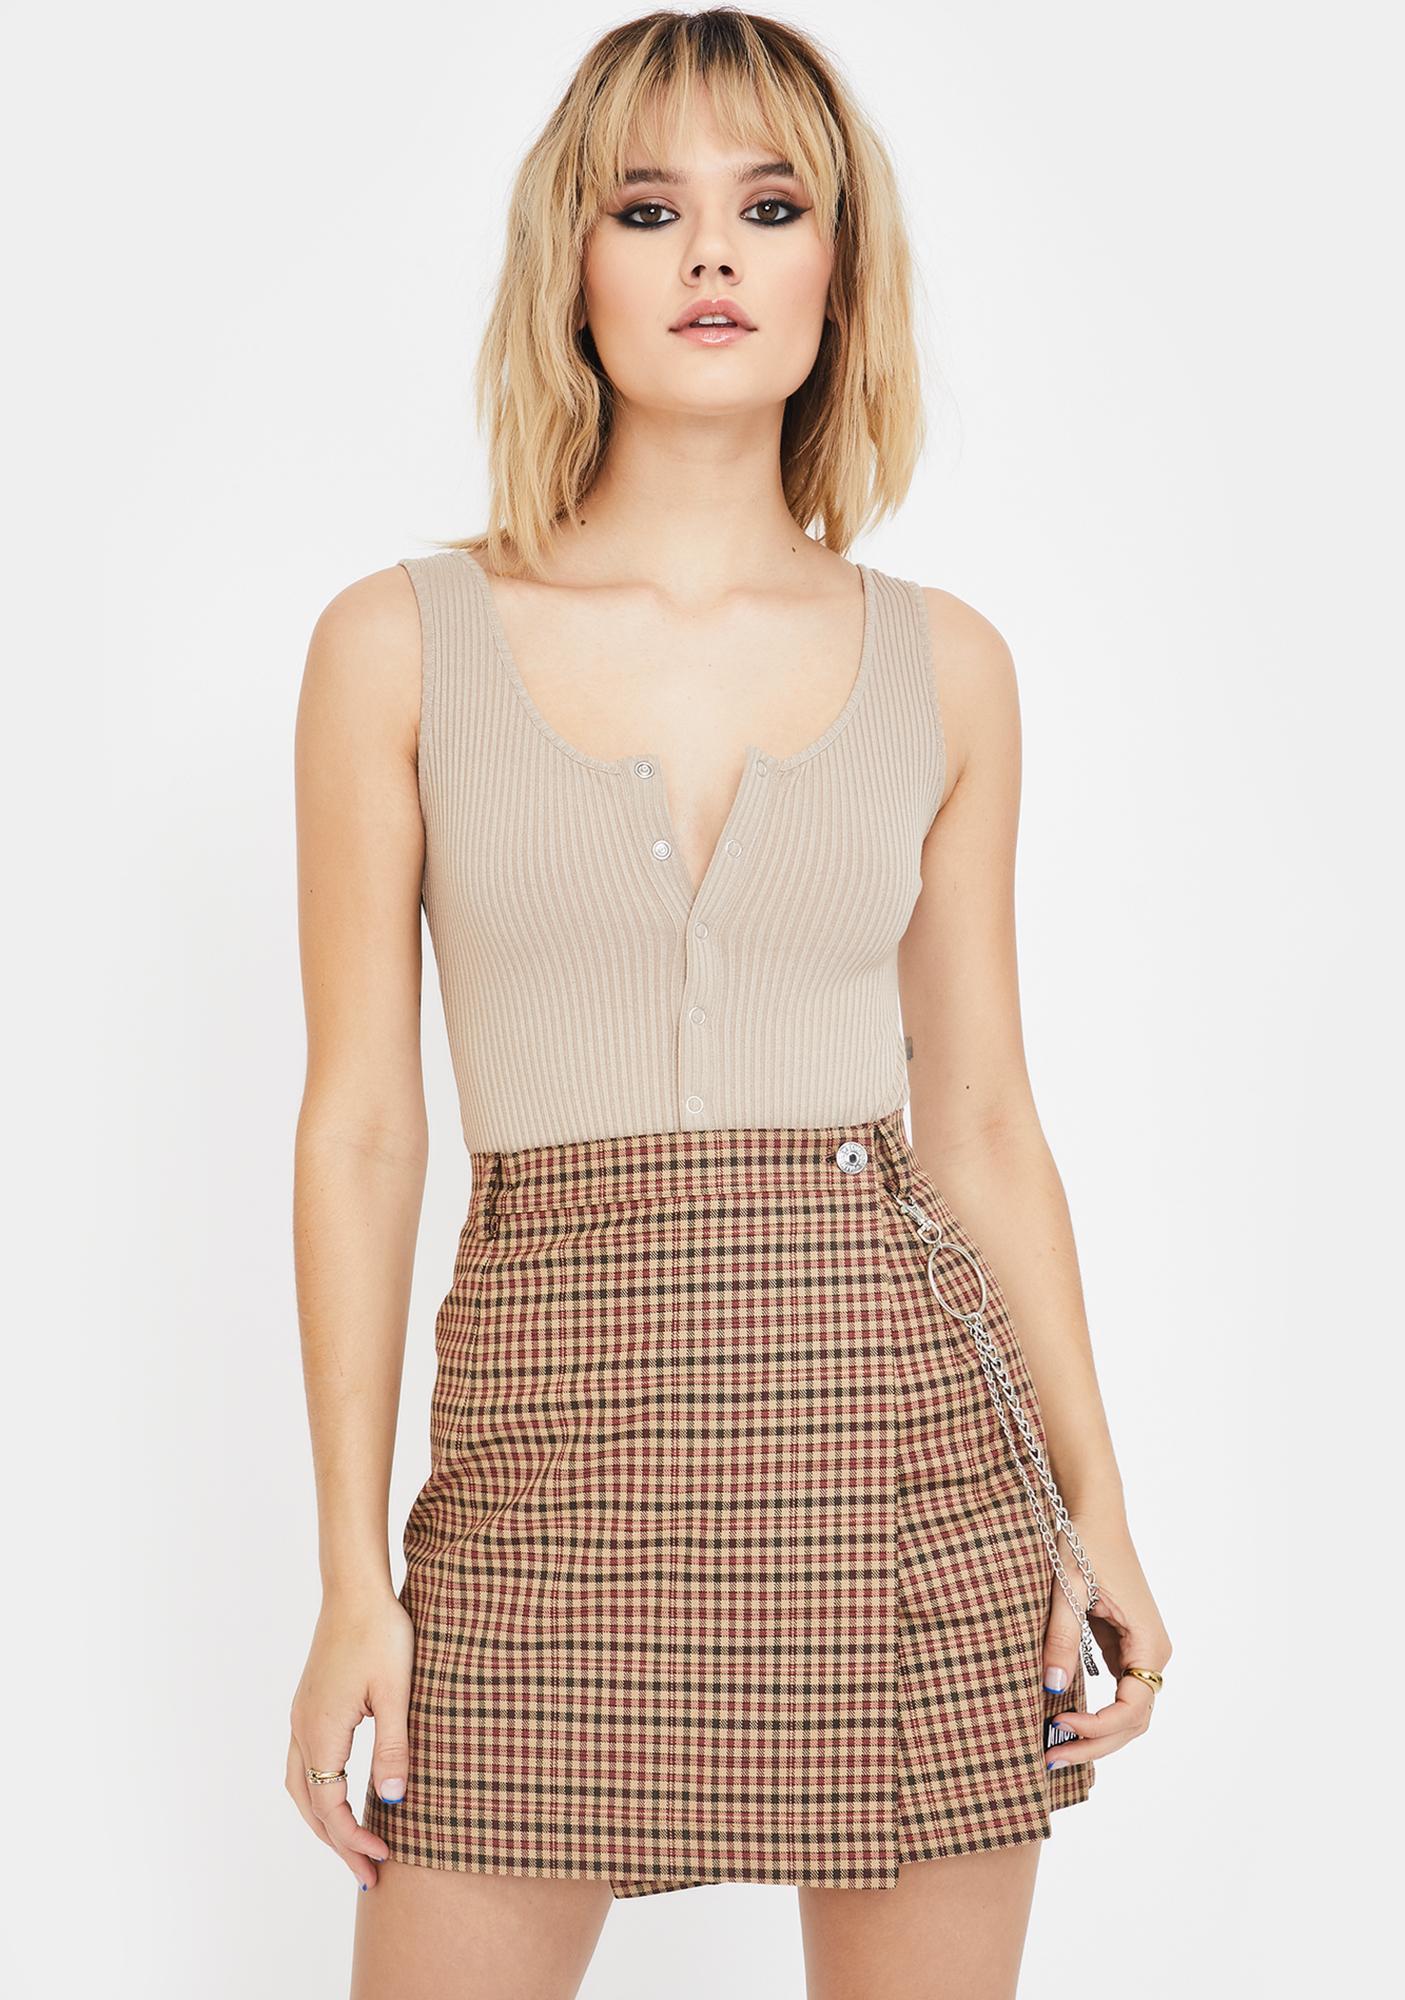 Minga Emily Plaid Skirt